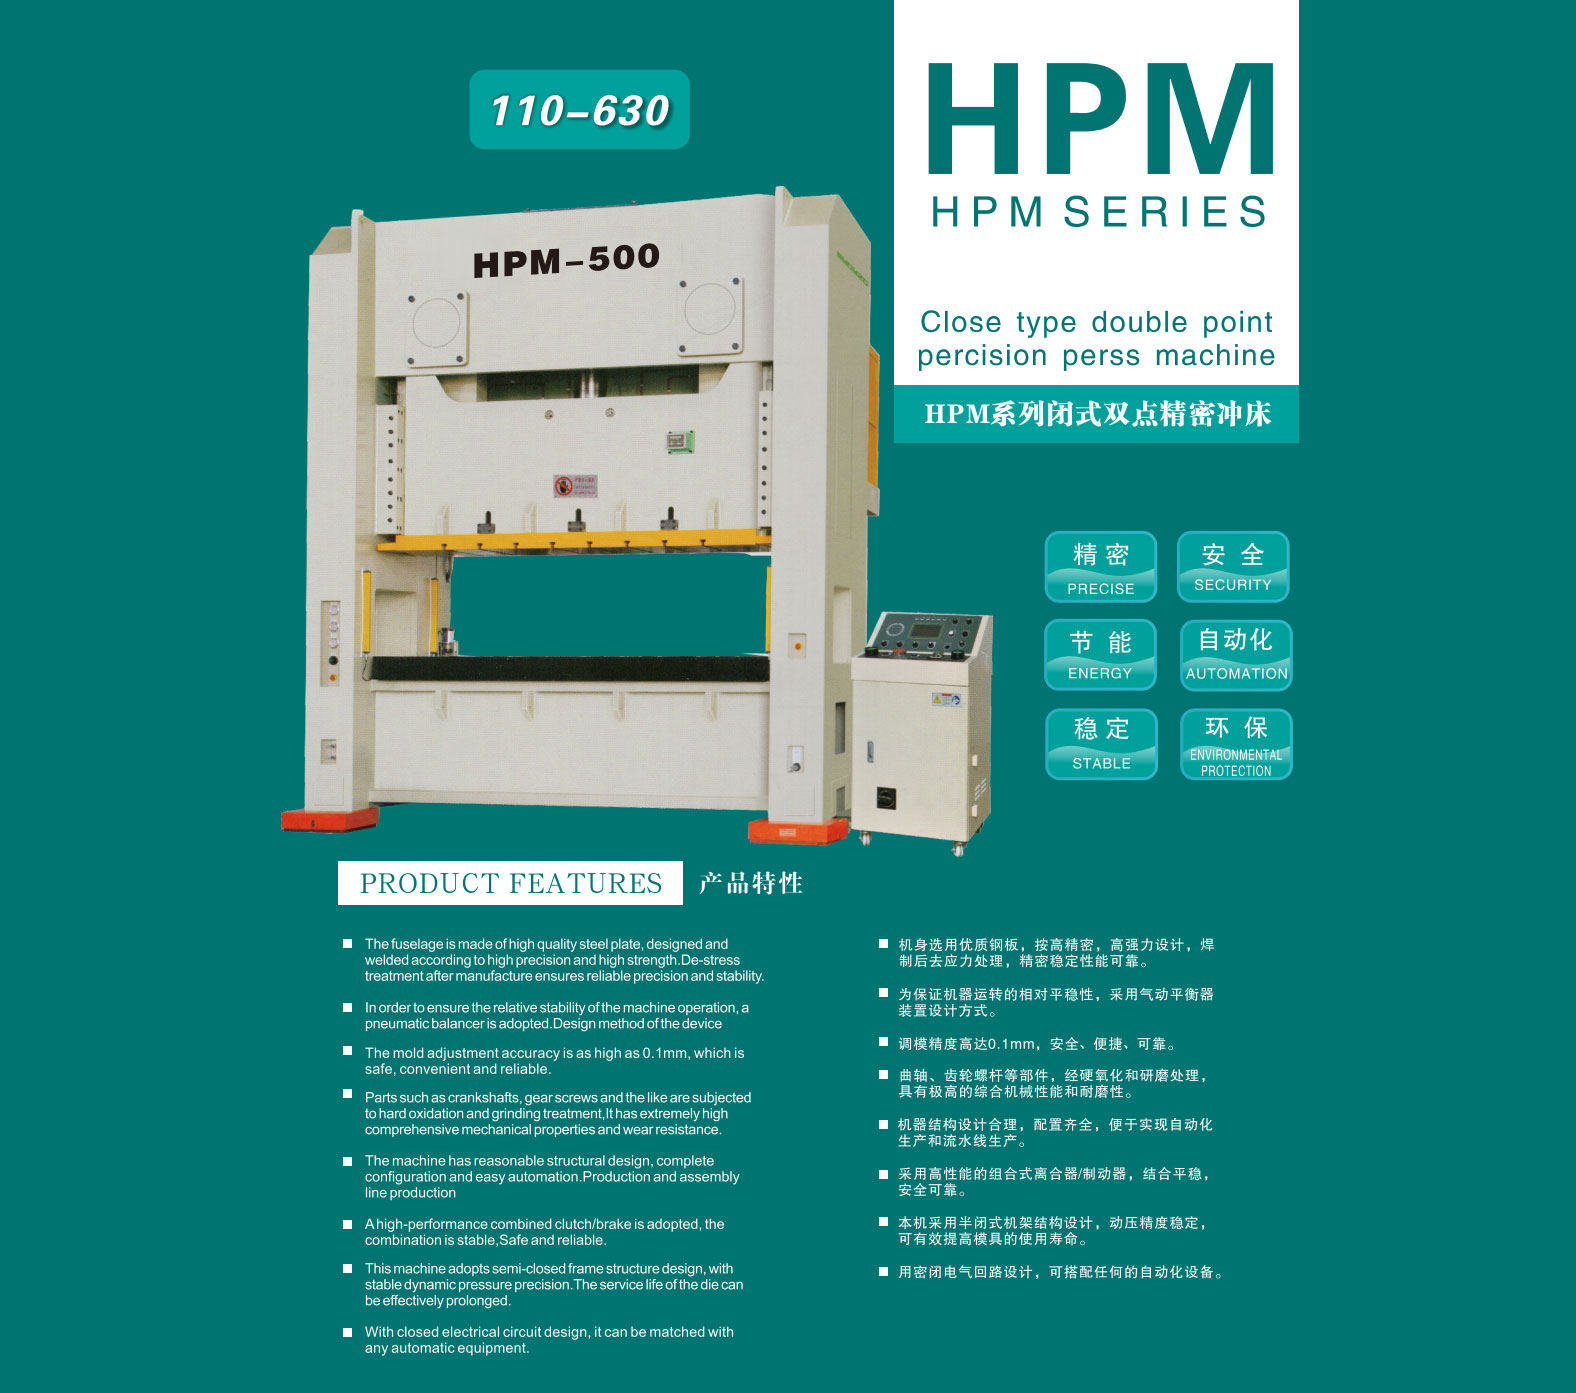 HPM-500